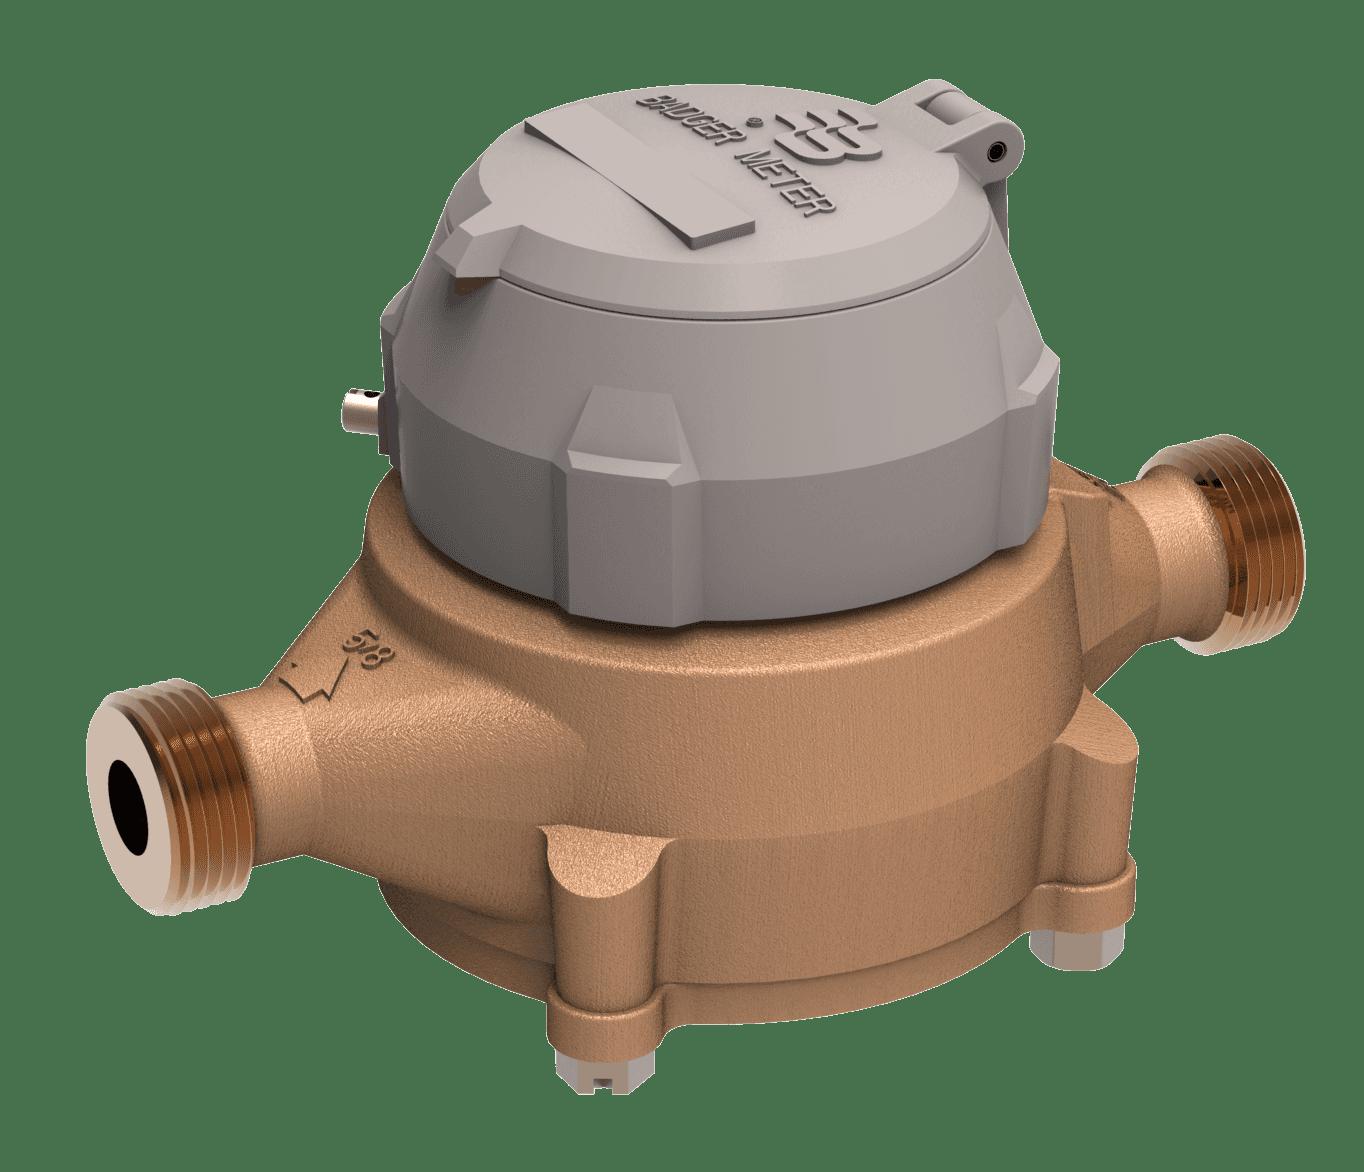 vortex flow meter wiring diagram home receptacle diagrams nutating disc displacement badger